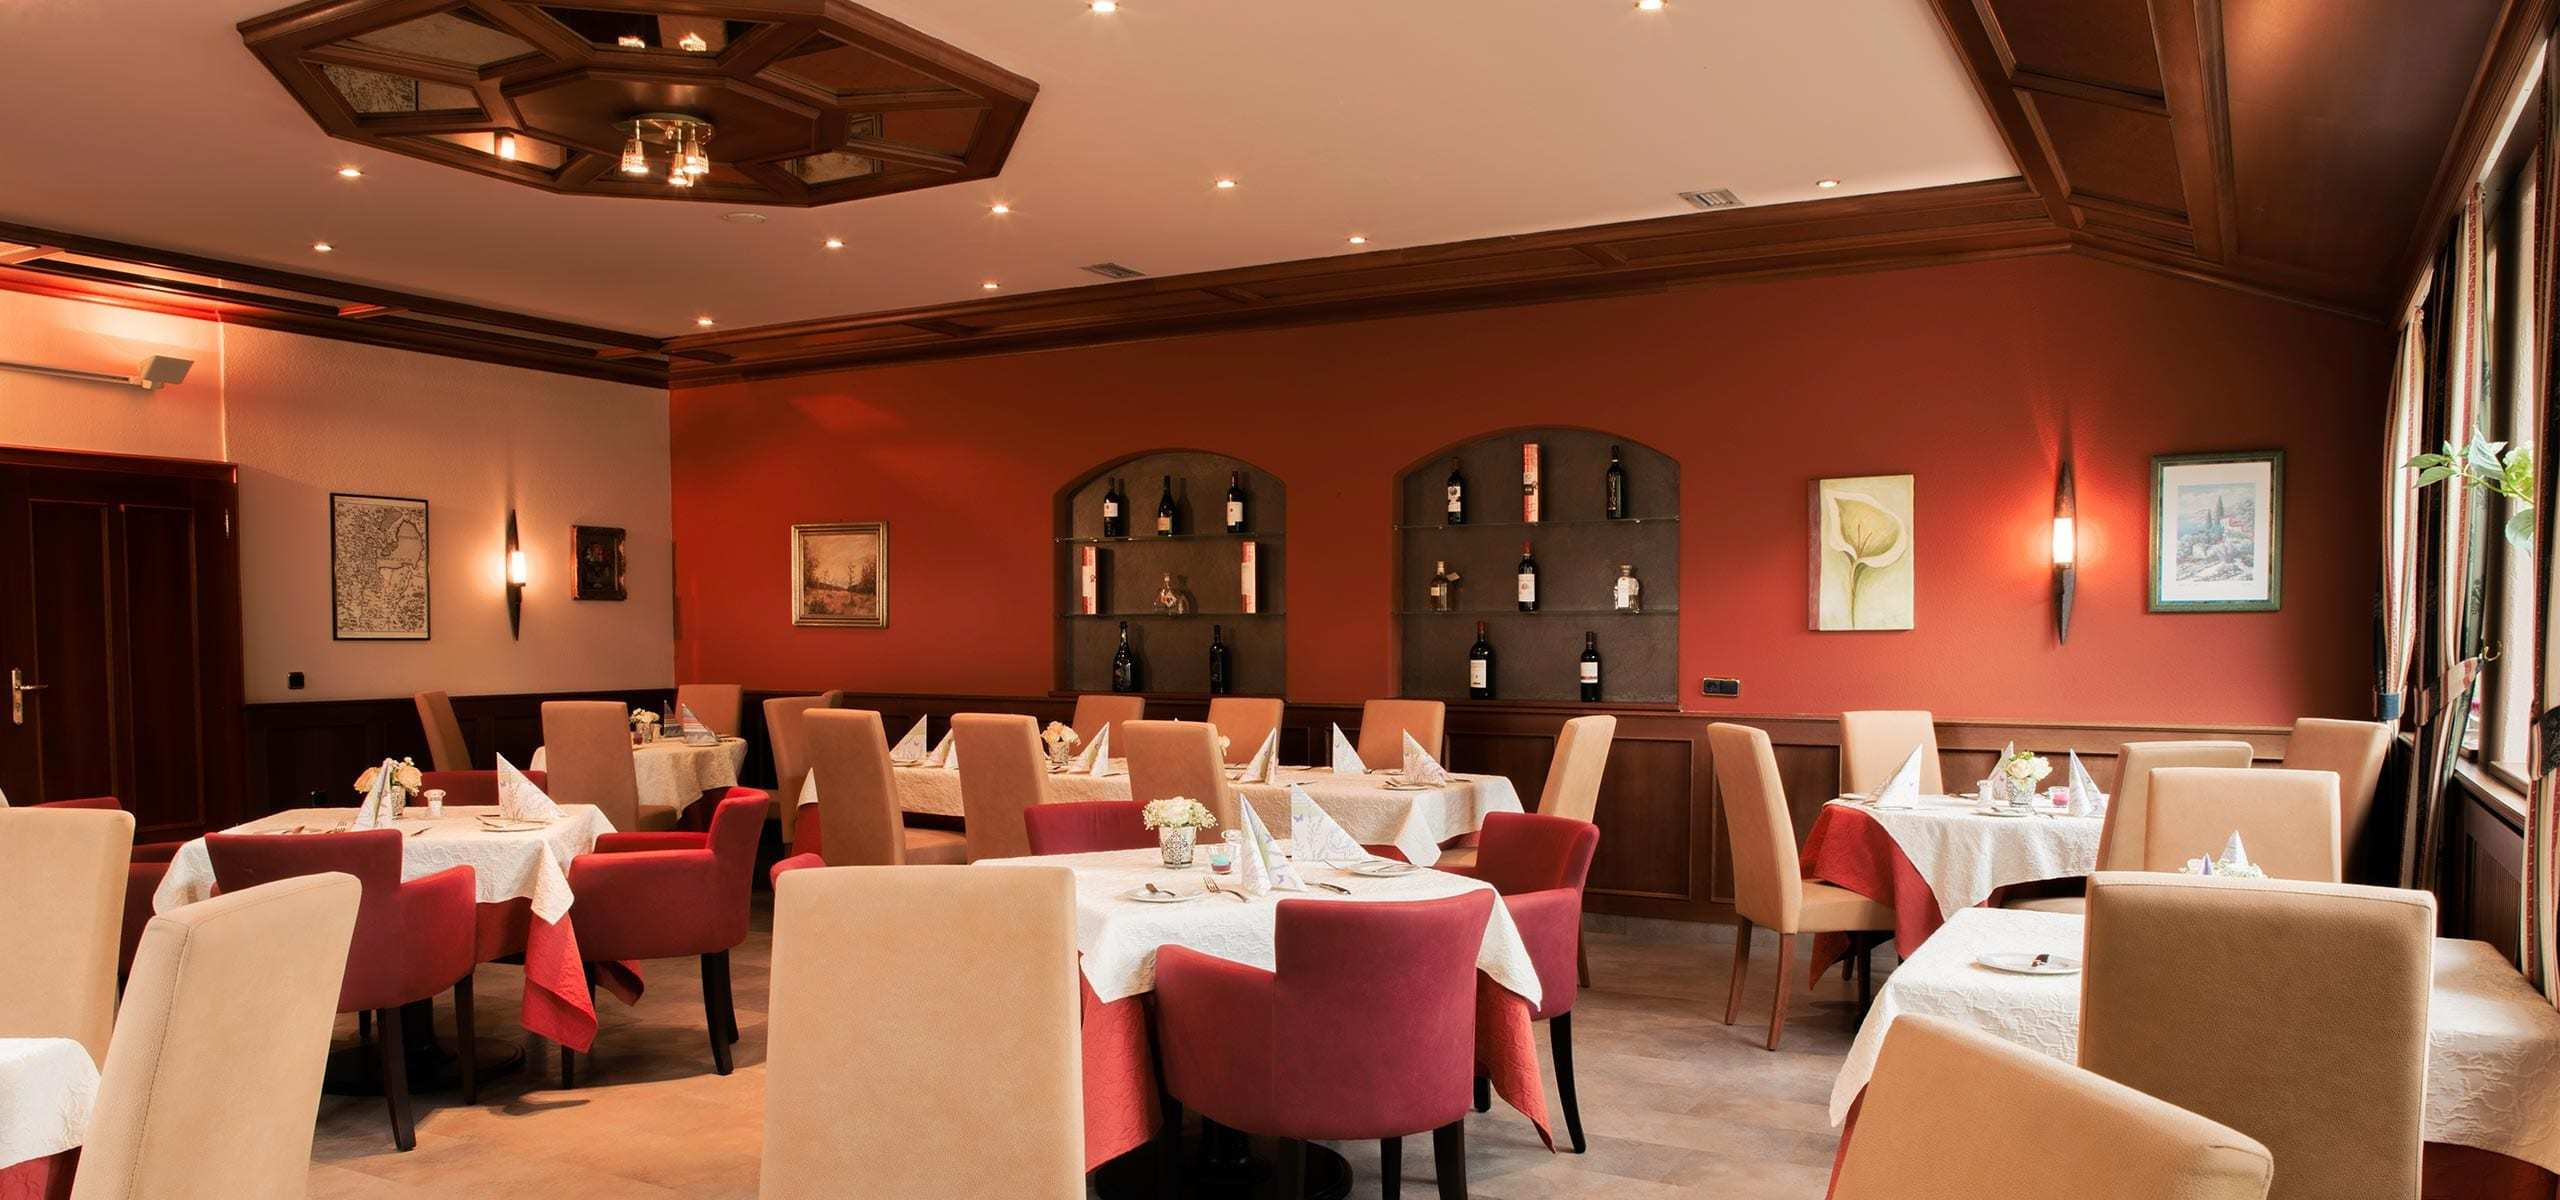 restaurant maximilians landhotel hallnberg